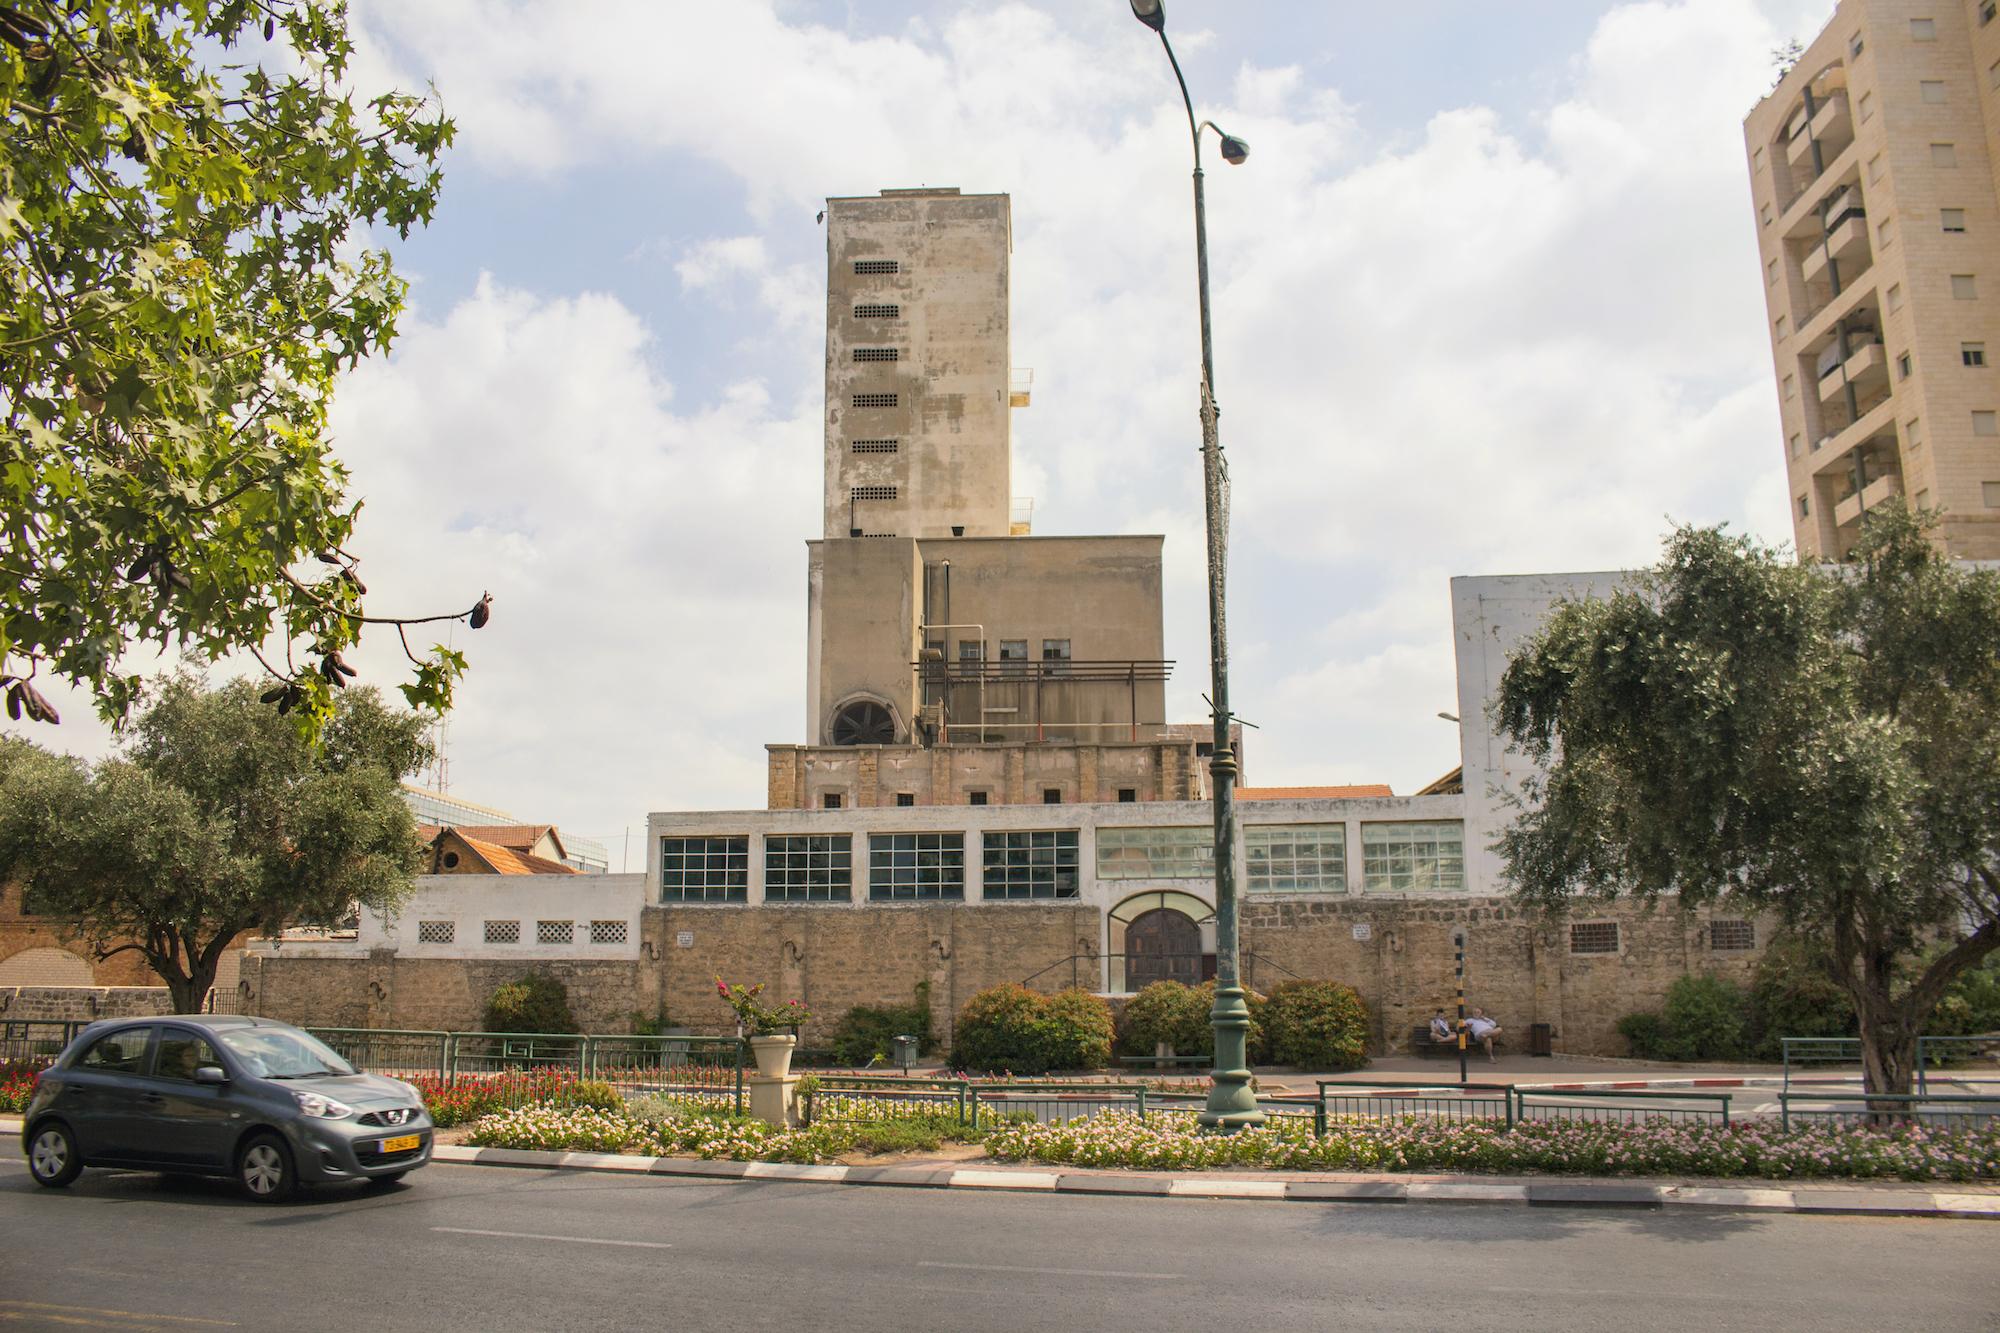 Photography part of series taken in Rishon LeZion, Israel by 'The Girl Mirage' Geena Matuson @geenamatuson, 2017.